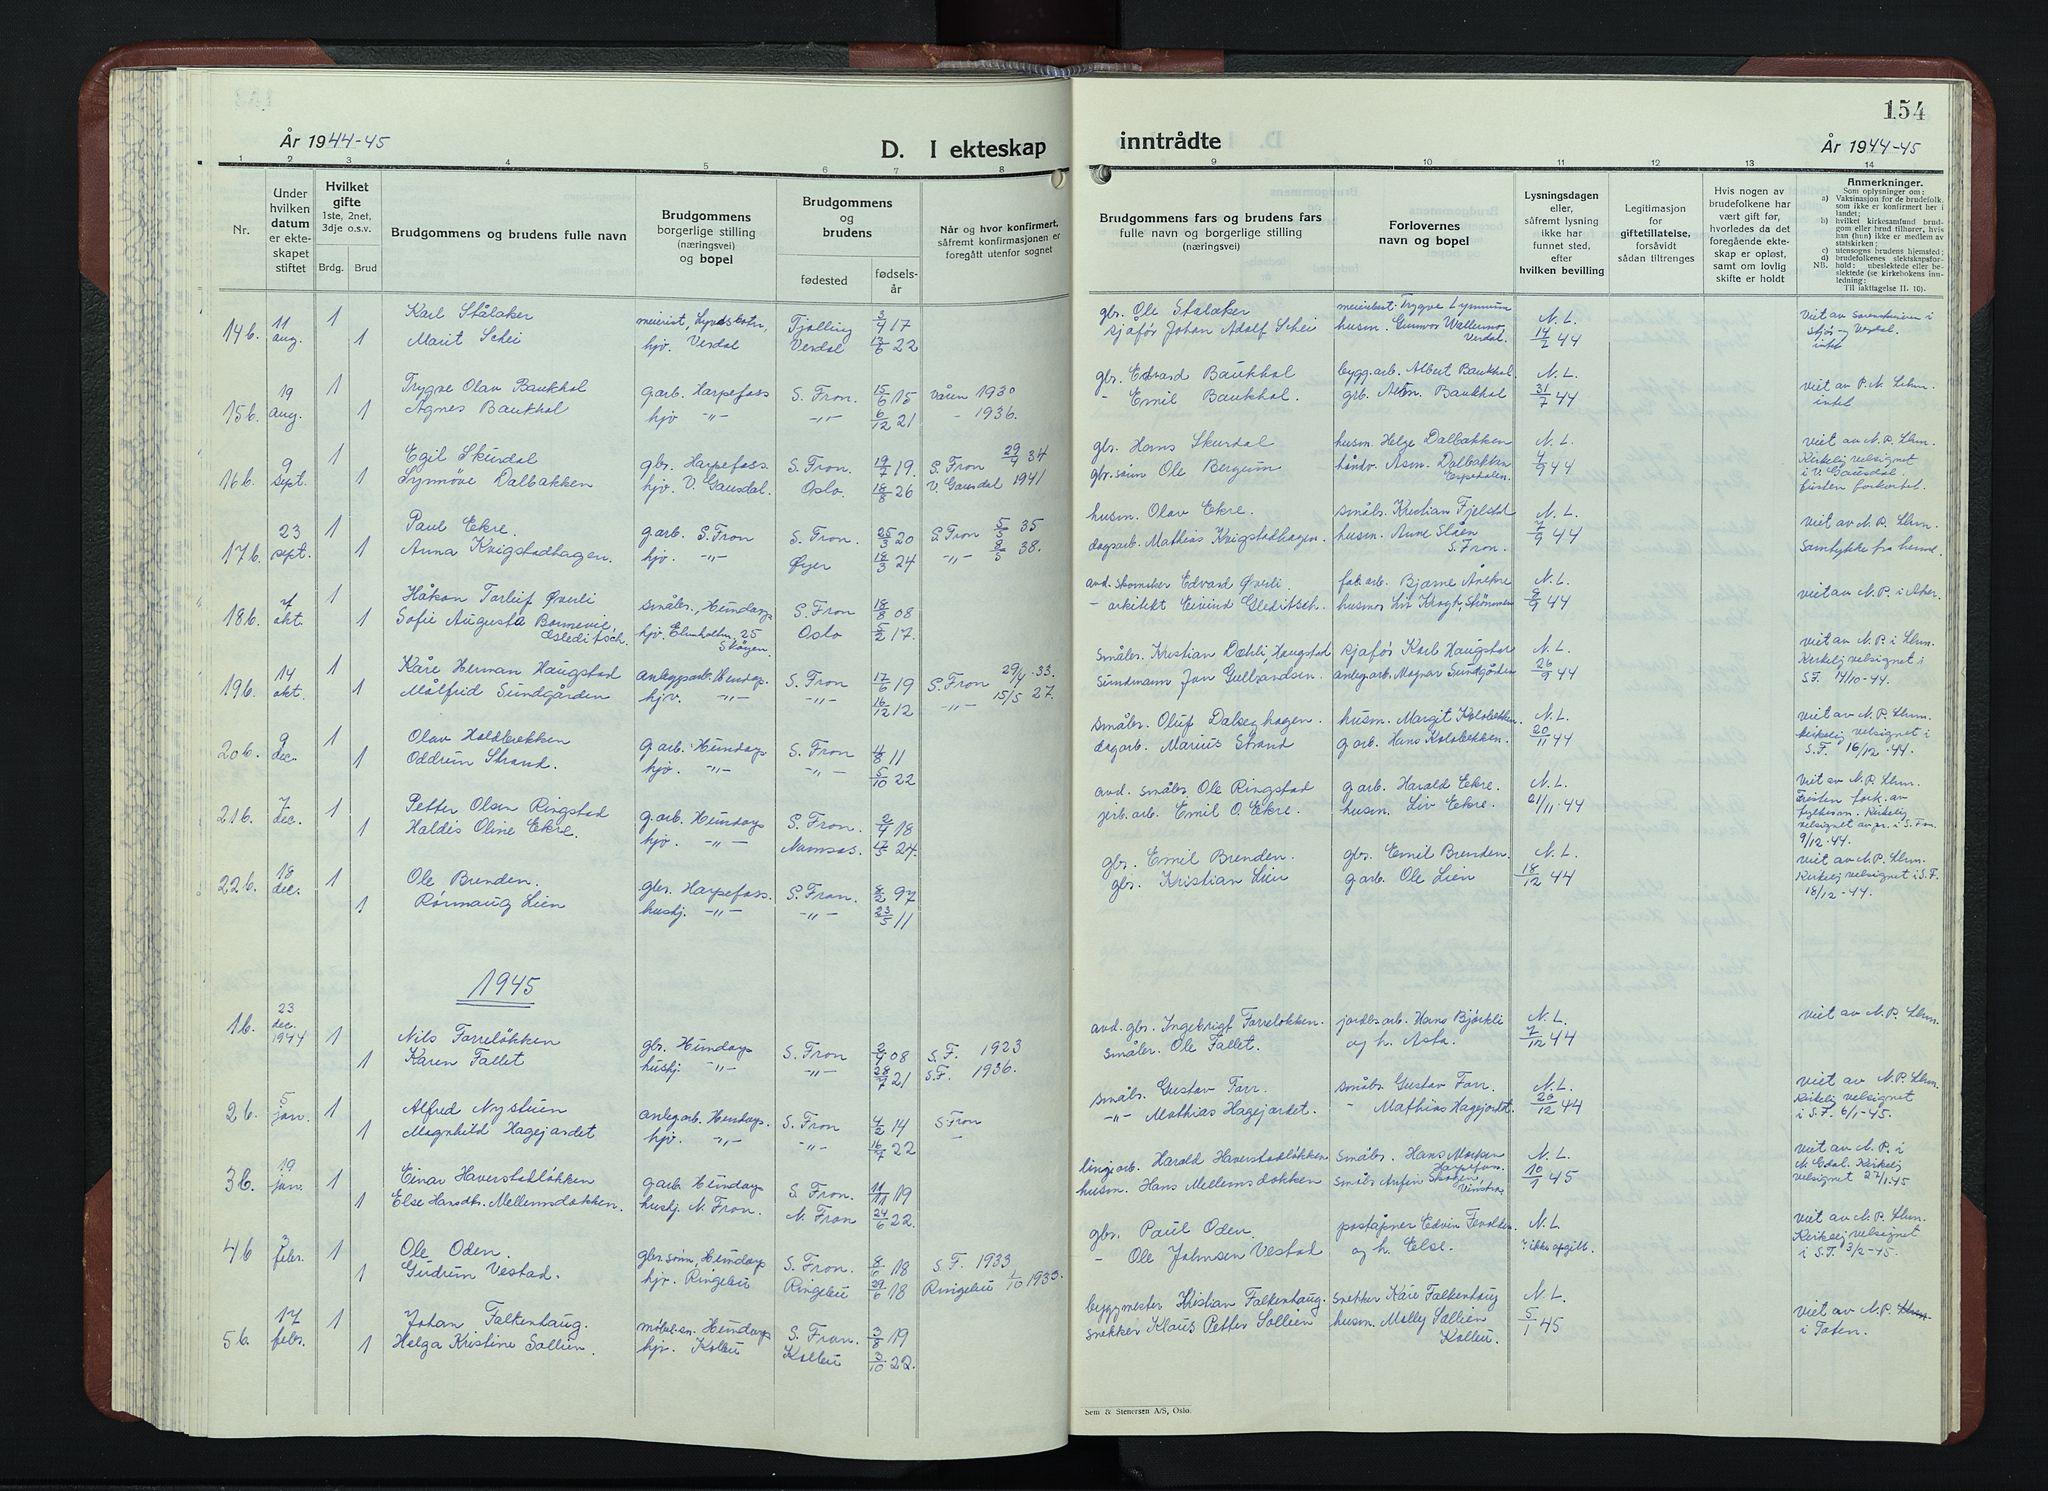 SAH, Sør-Fron prestekontor, H/Ha/Hab/L0006: Klokkerbok nr. 6, 1933-1948, s. 154